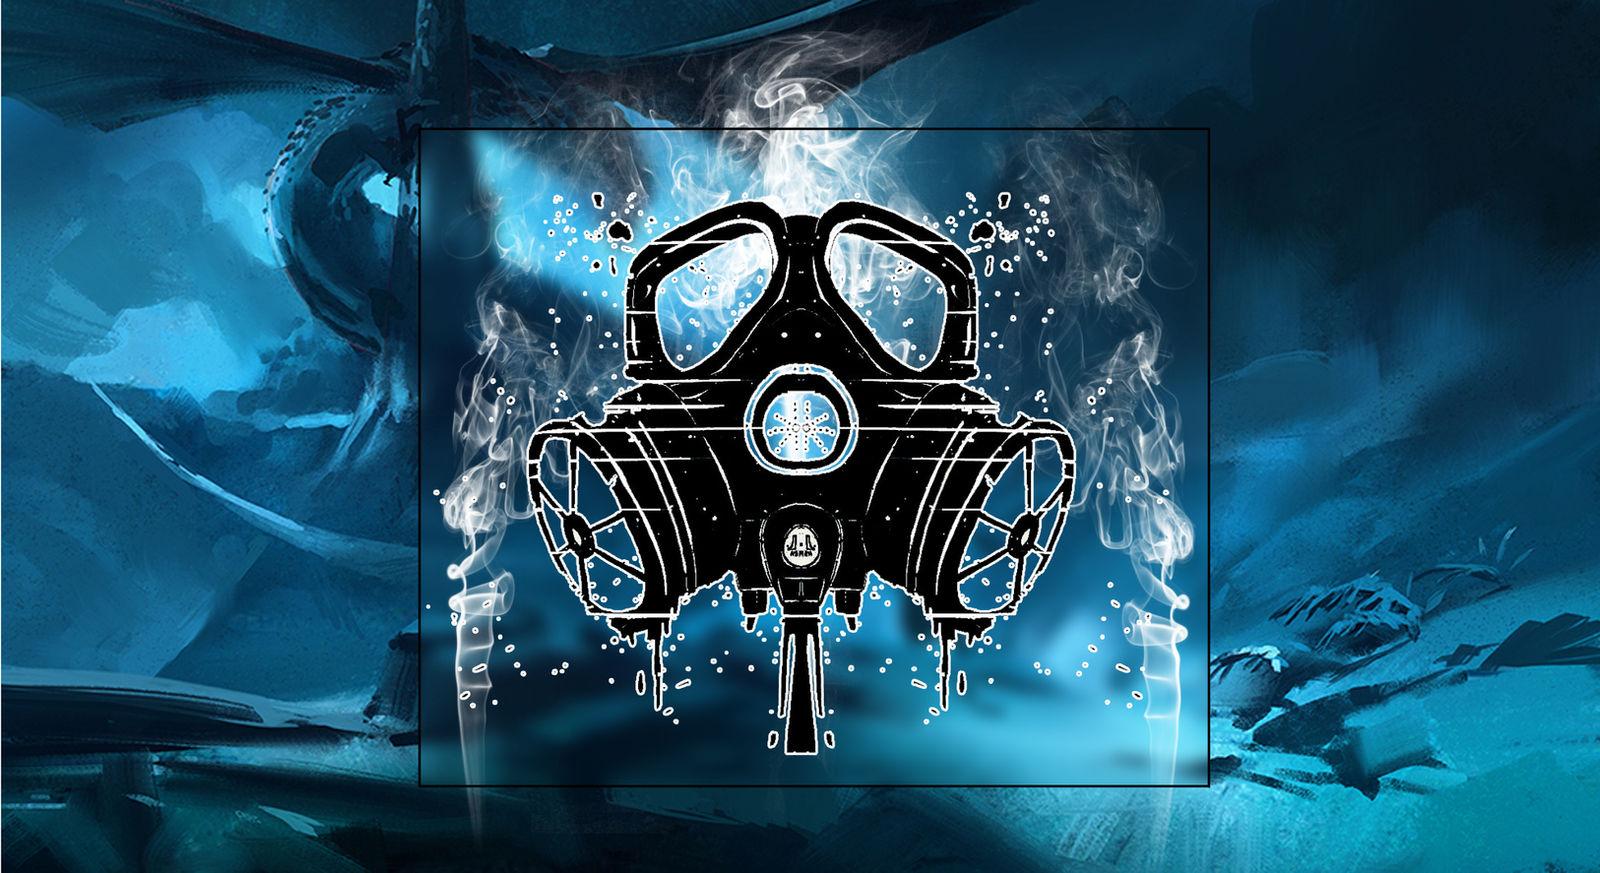 Gas Mask Wallpaper Hd By Twillrex On Deviantart